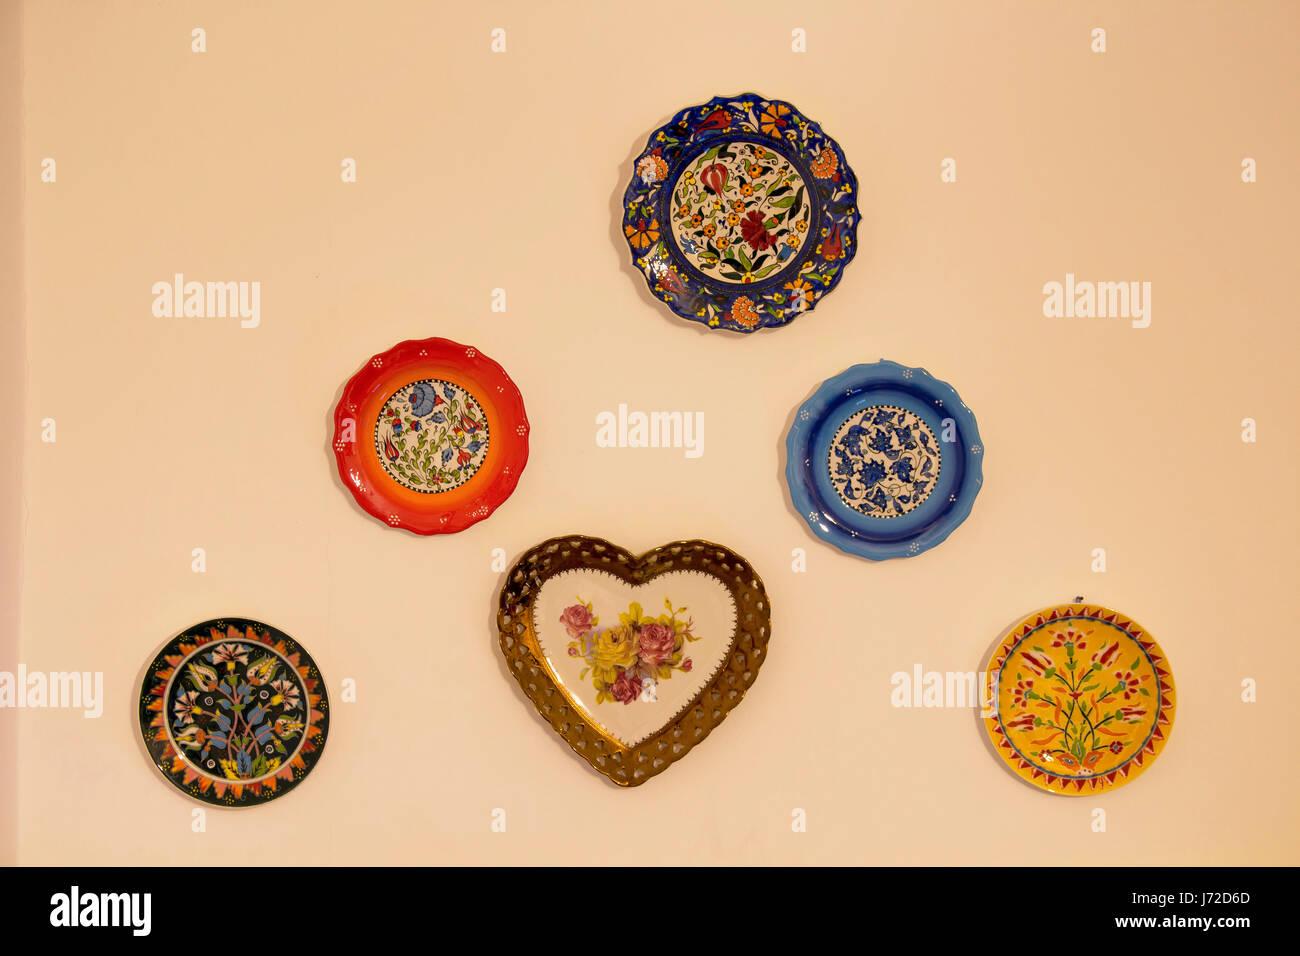 Decorative Wall Plates Stock Photos & Decorative Wall Plates Stock ...